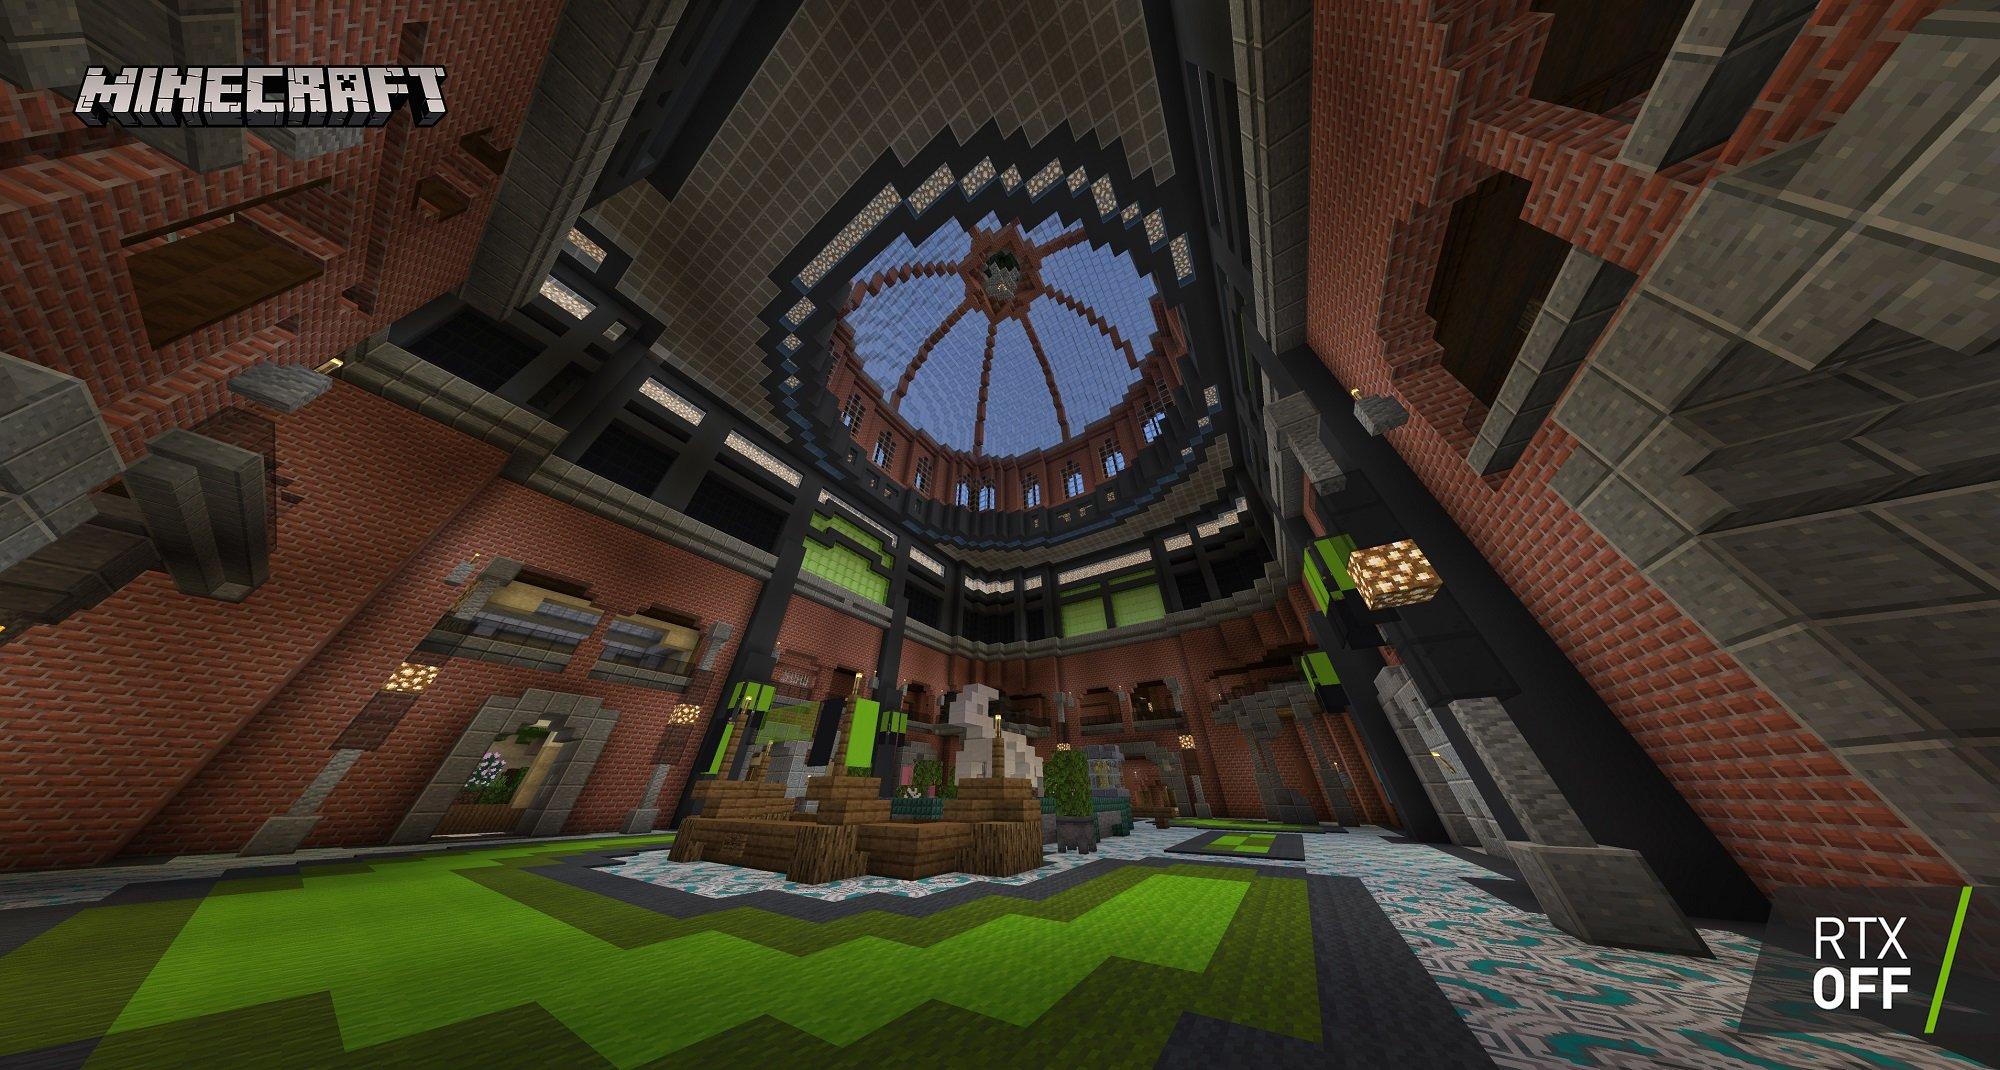 minecraft with rtx beta razzleberries texture showcase 003 rtx off